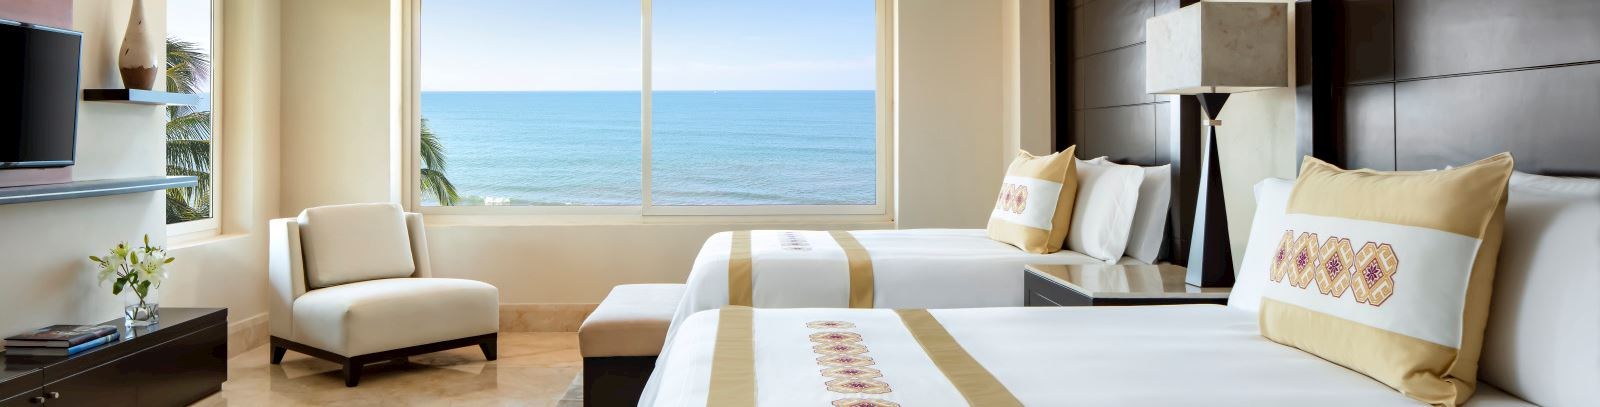 Suites in Grand Velas Riviera Nayarit, Mexico